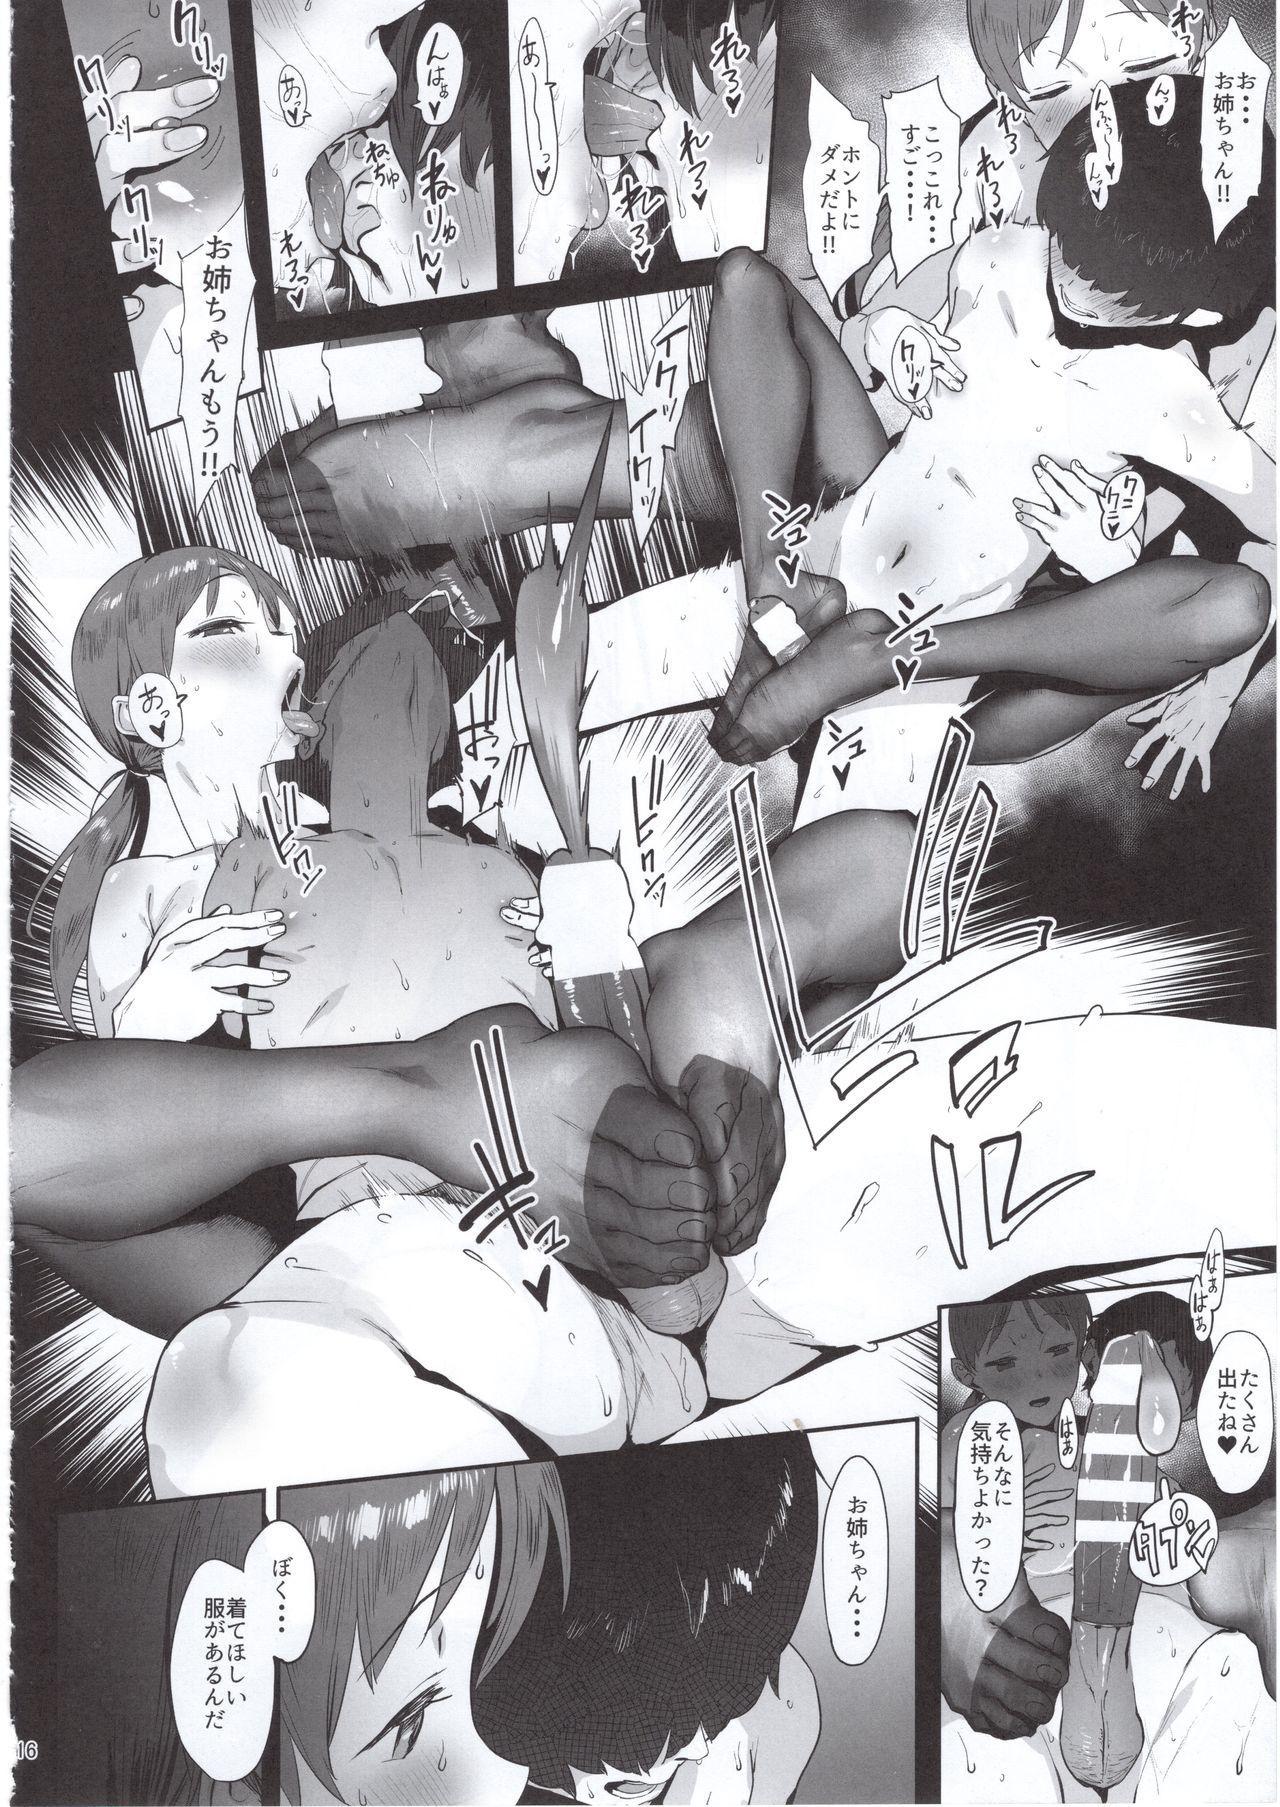 Nitta no Onee-chan 14